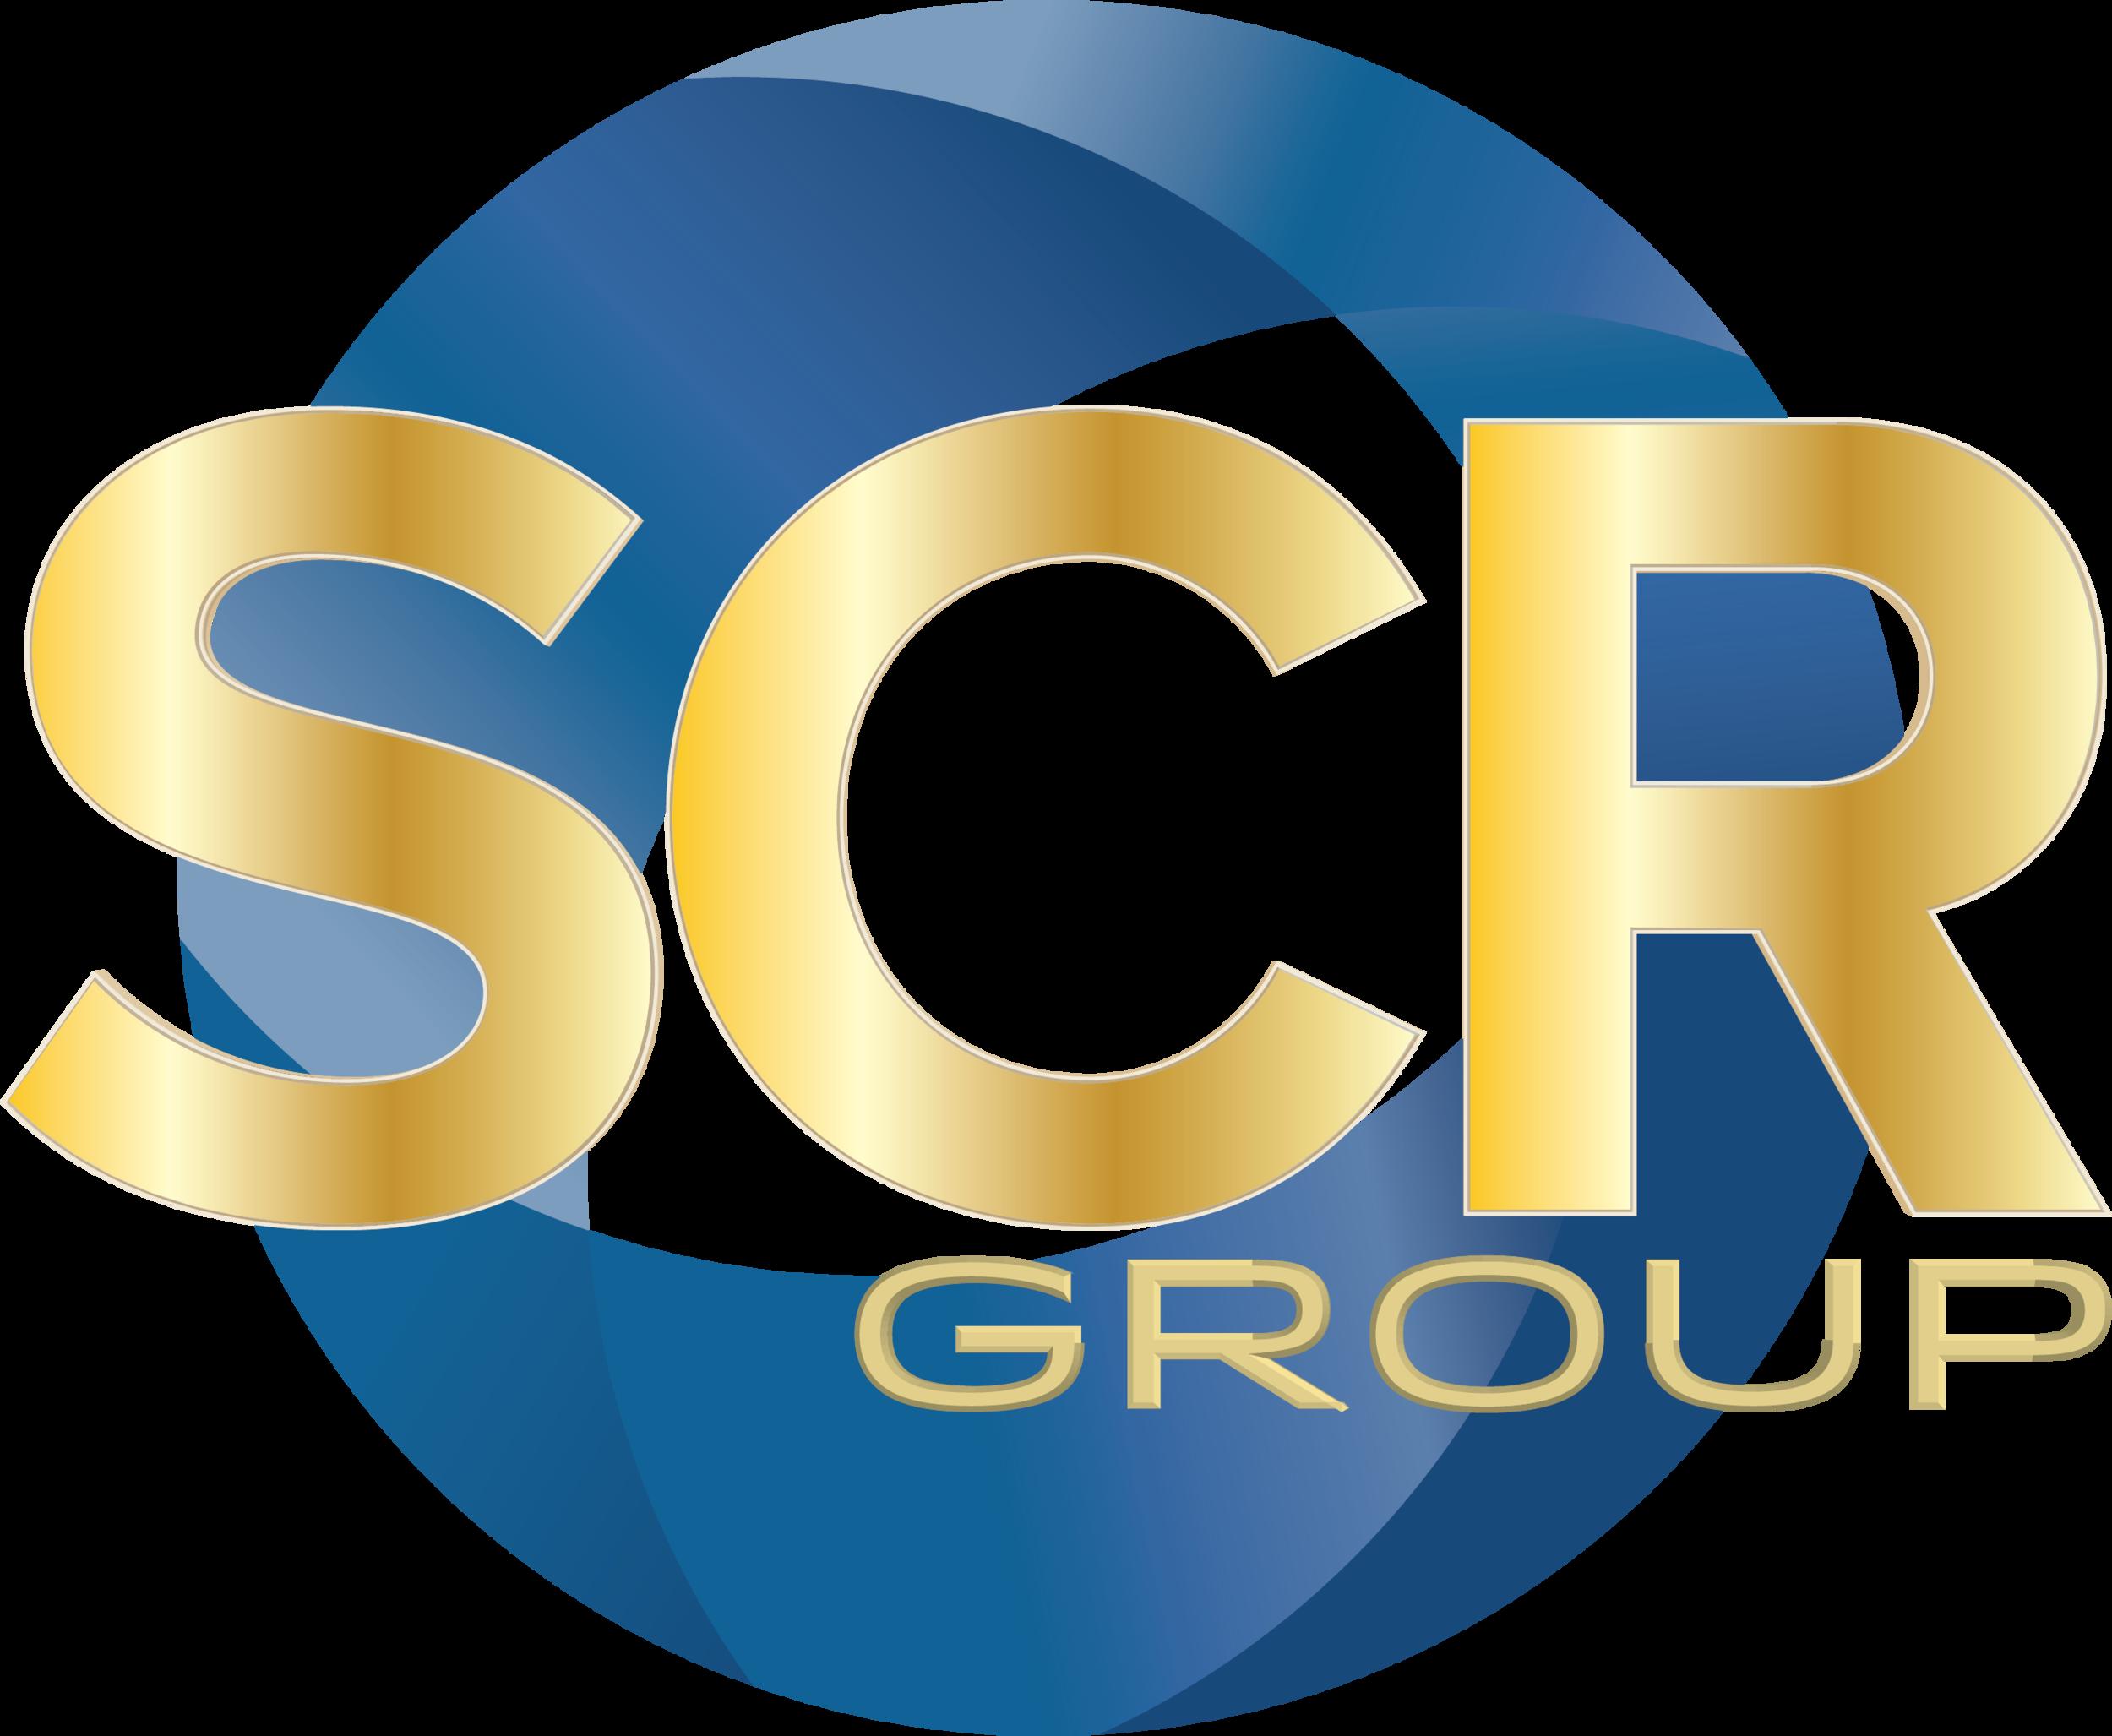 scr-logo-final.png